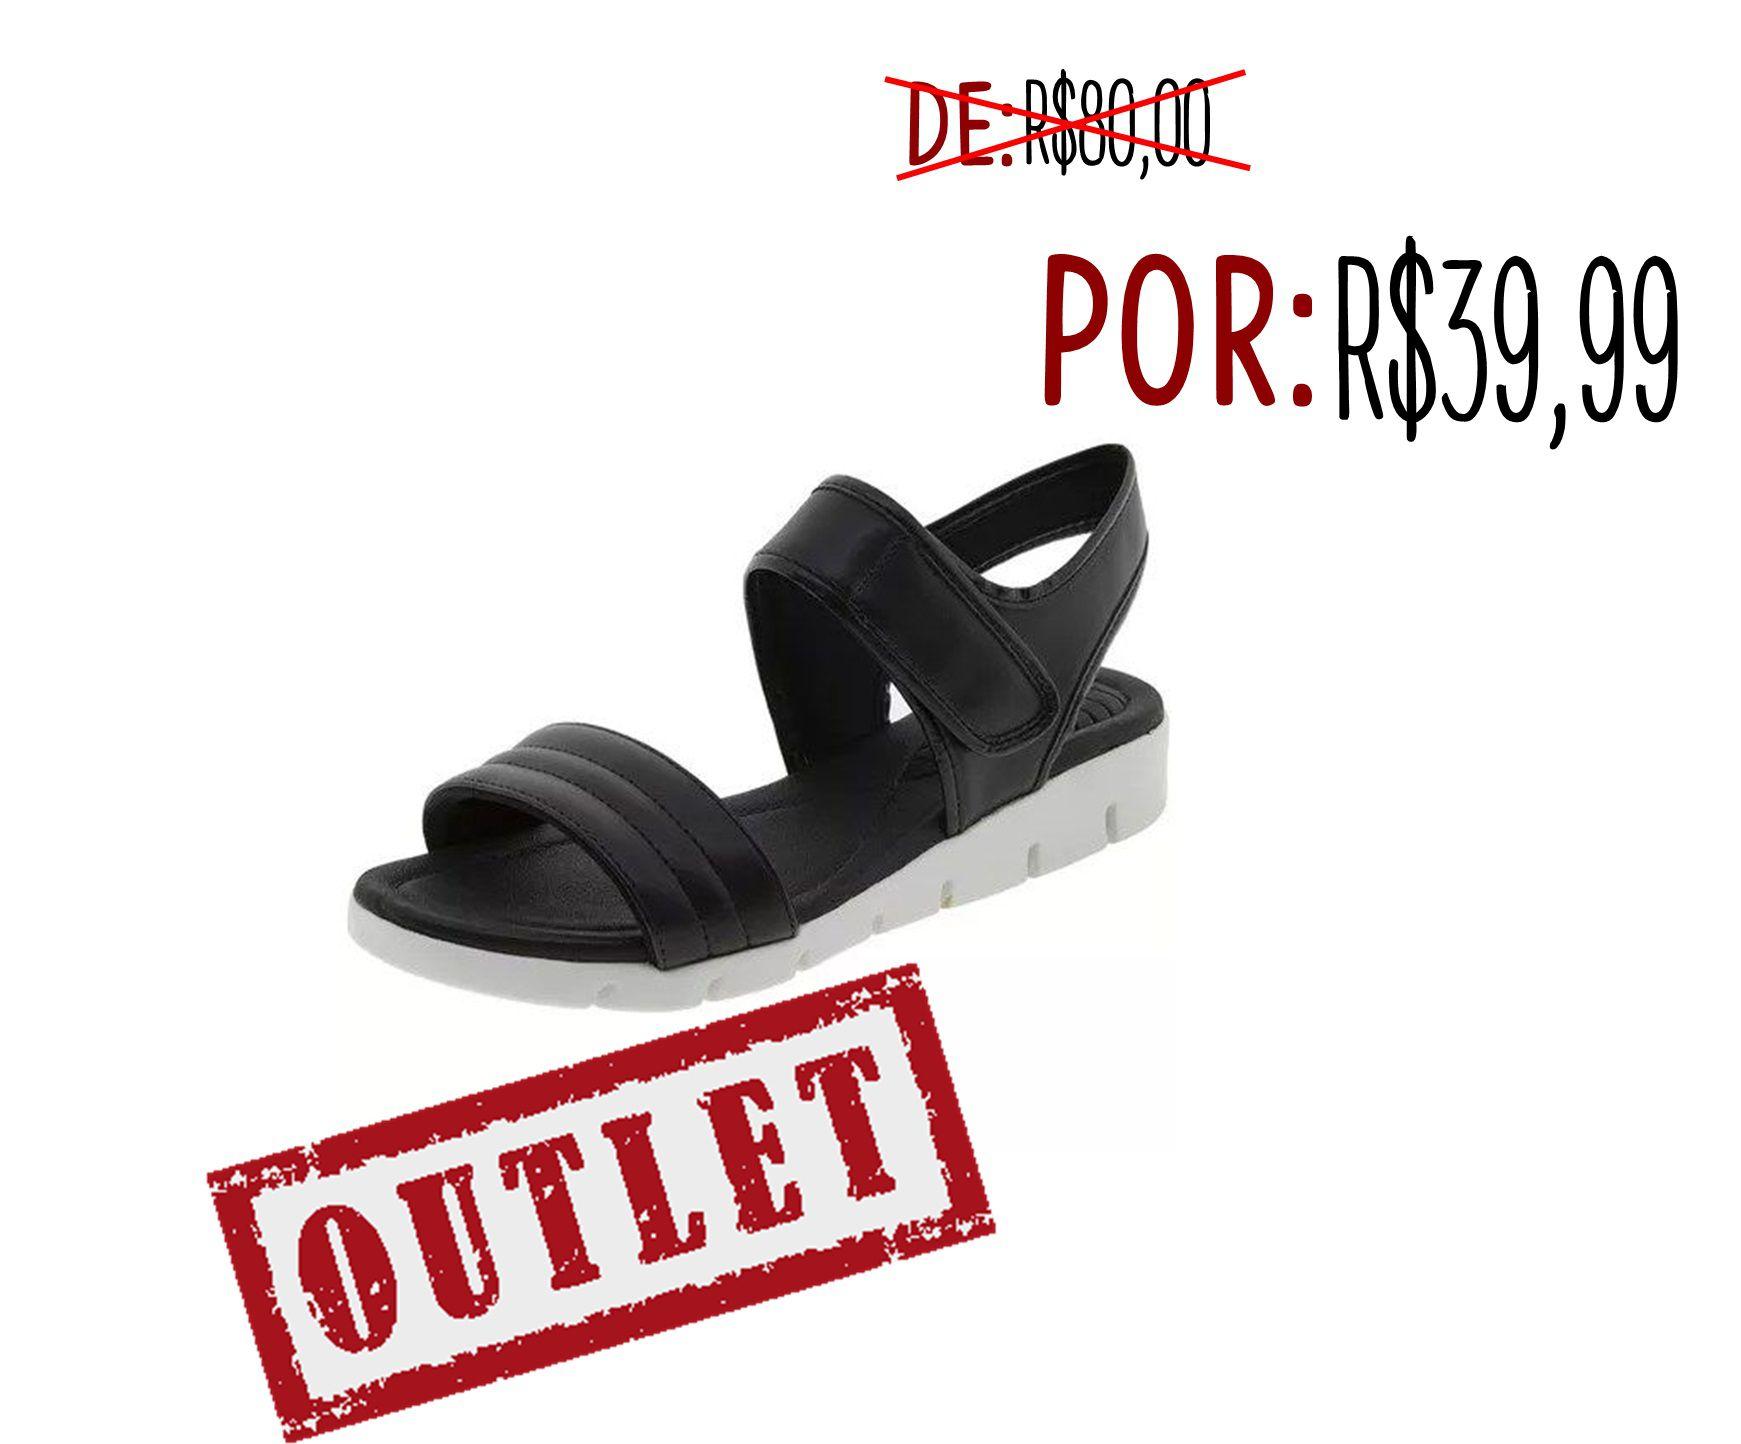 729fad67e Sandalia Azaleia Flexivel Salto Baixo Feminino Confortavel Leve